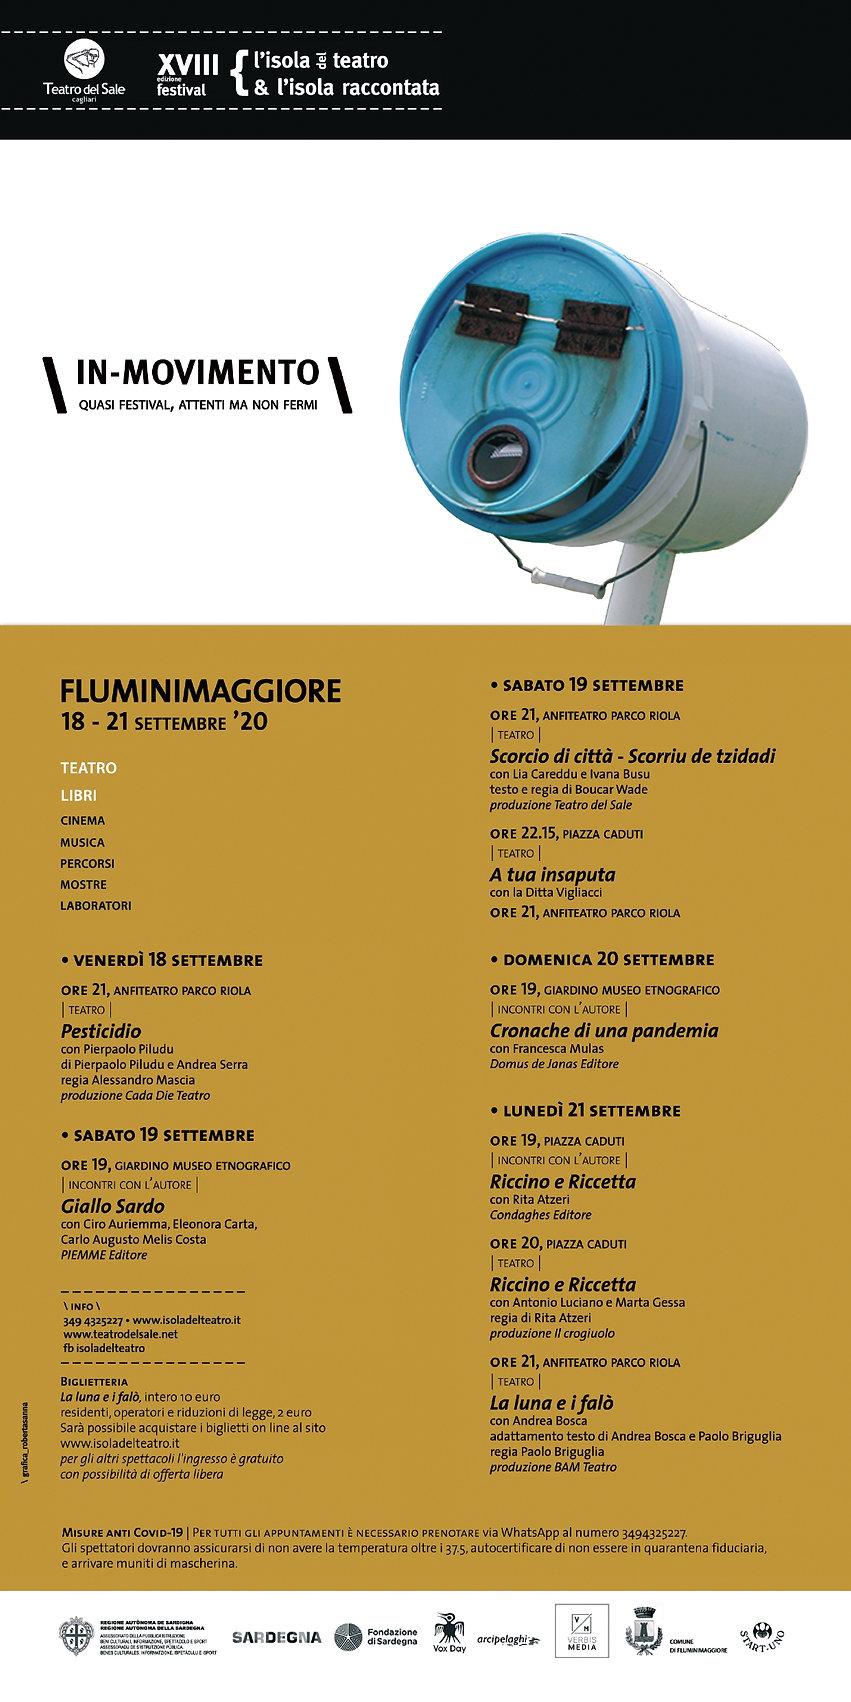 ese loc flumini XVIII 2_page-0001.jpg